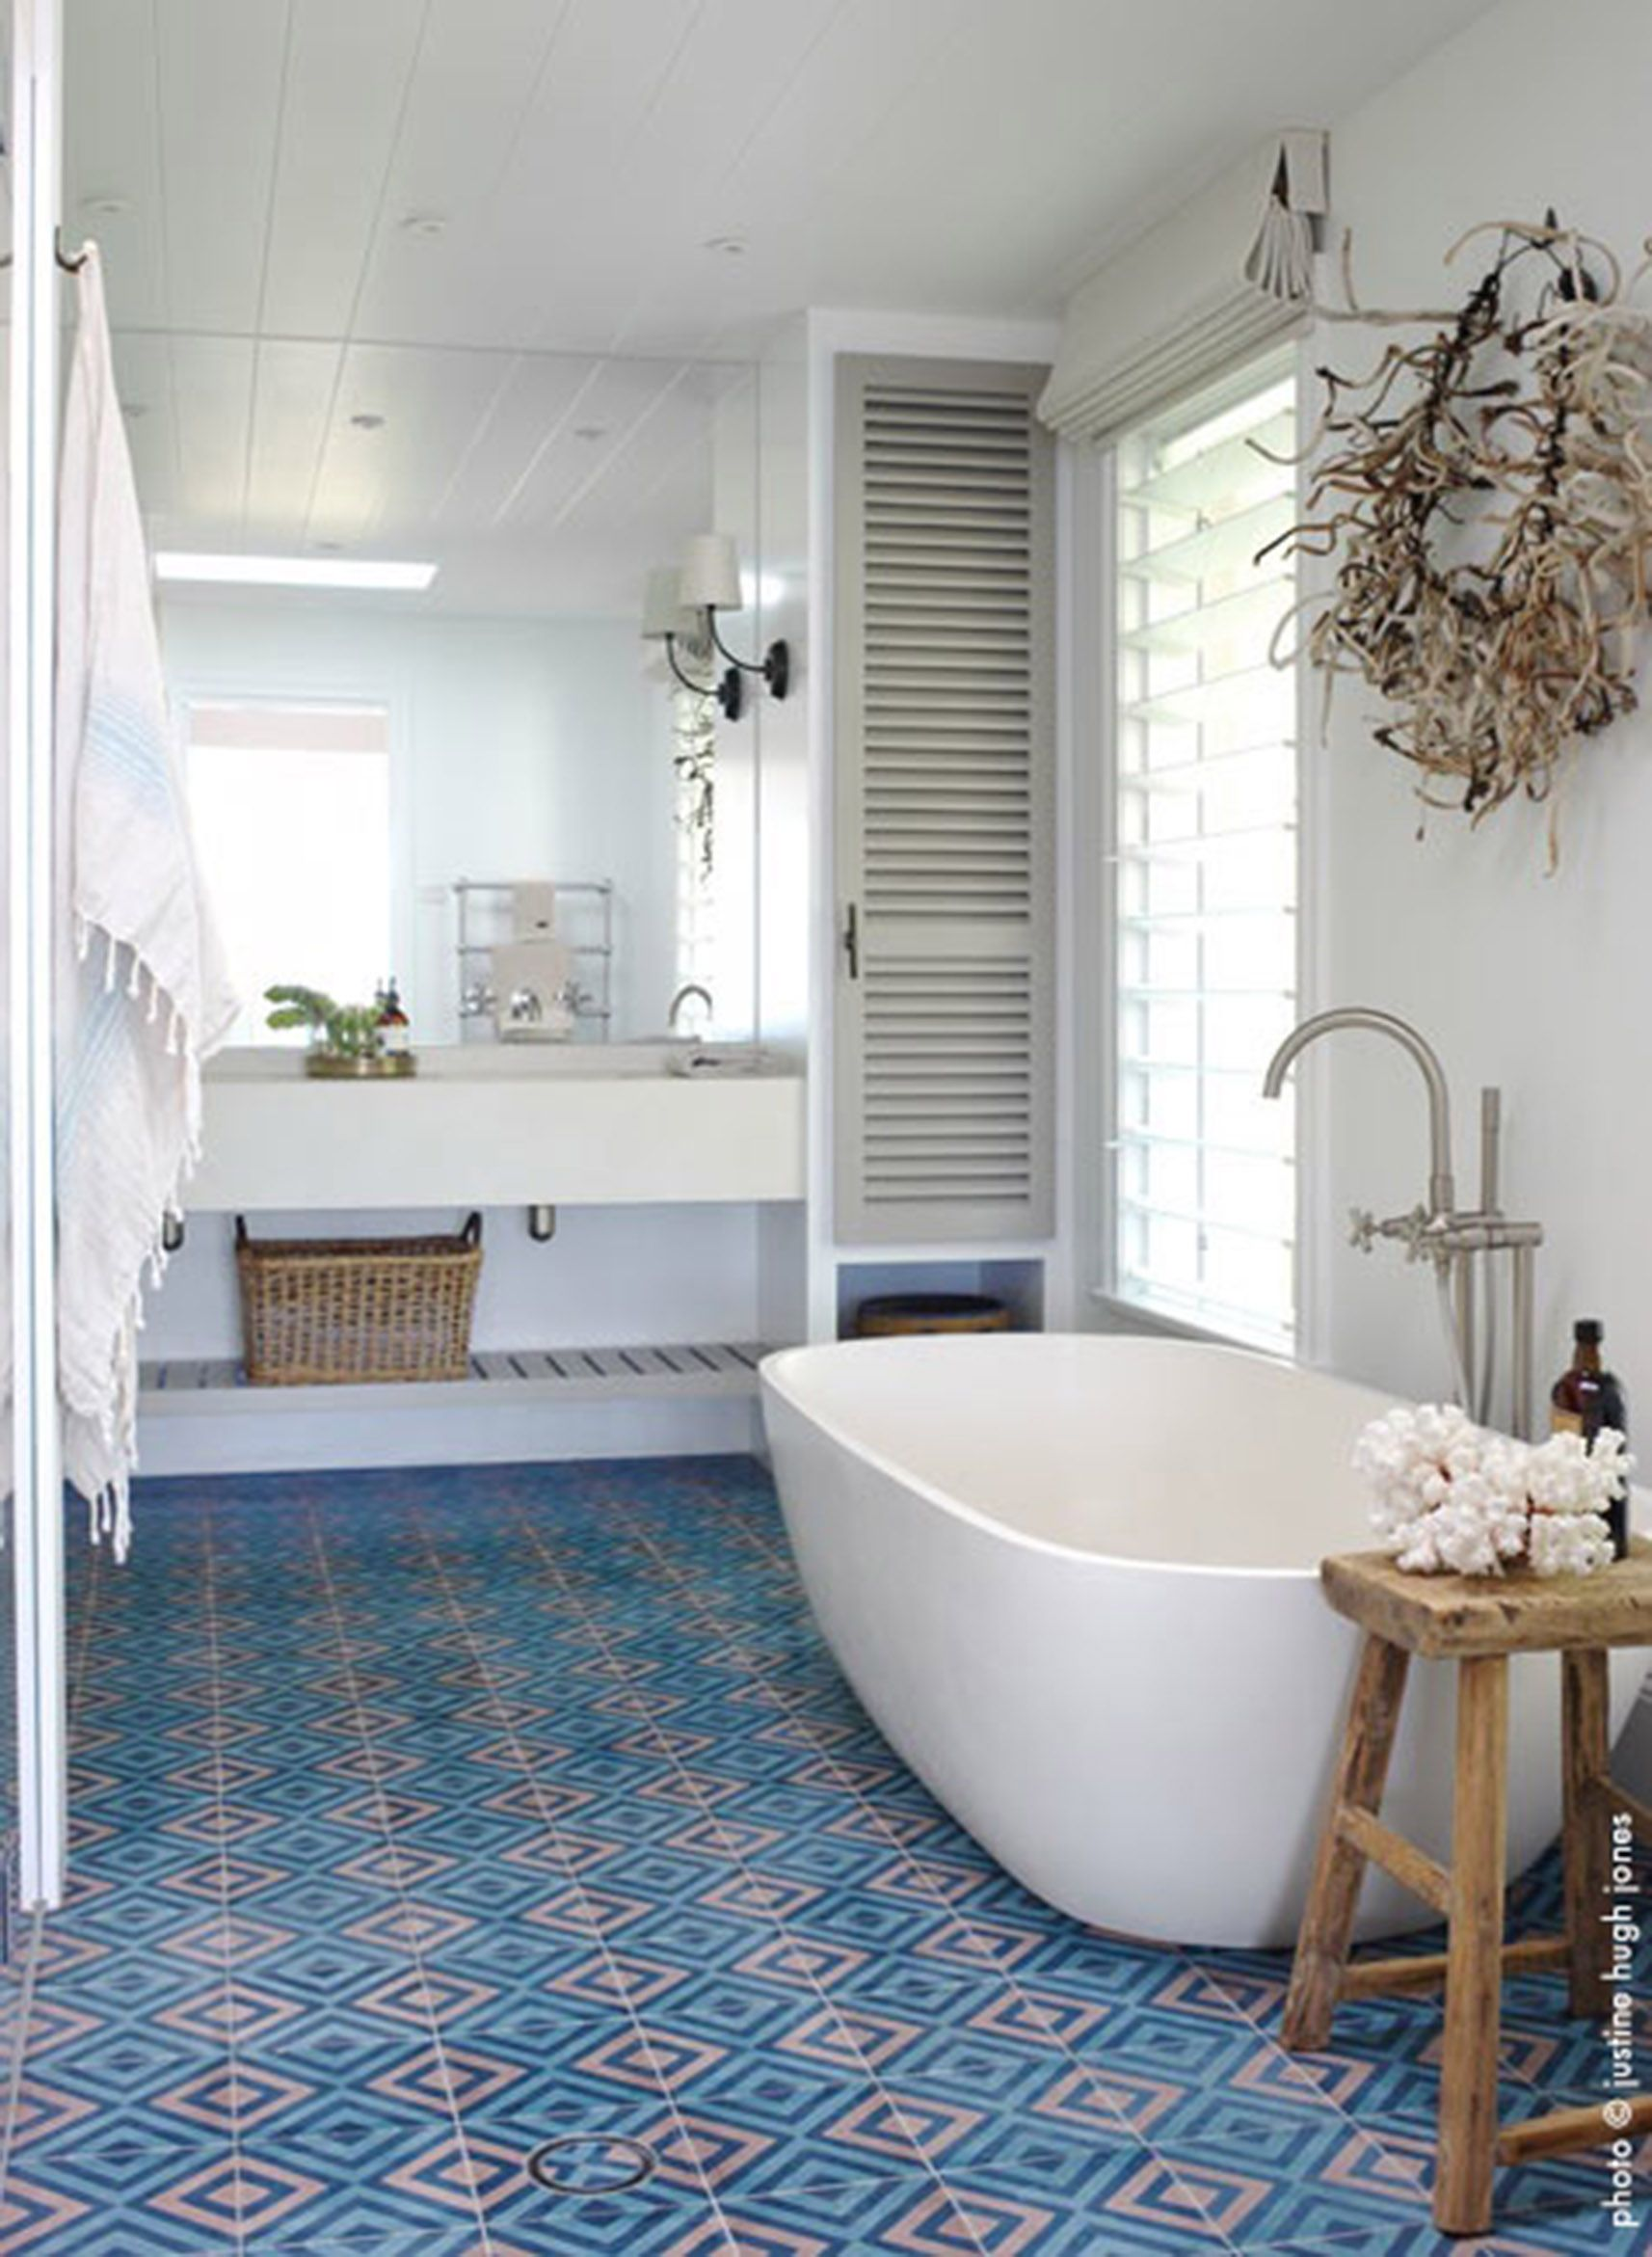 Image result for moroccan bathroom tiles | Bathroom | Pinterest ...